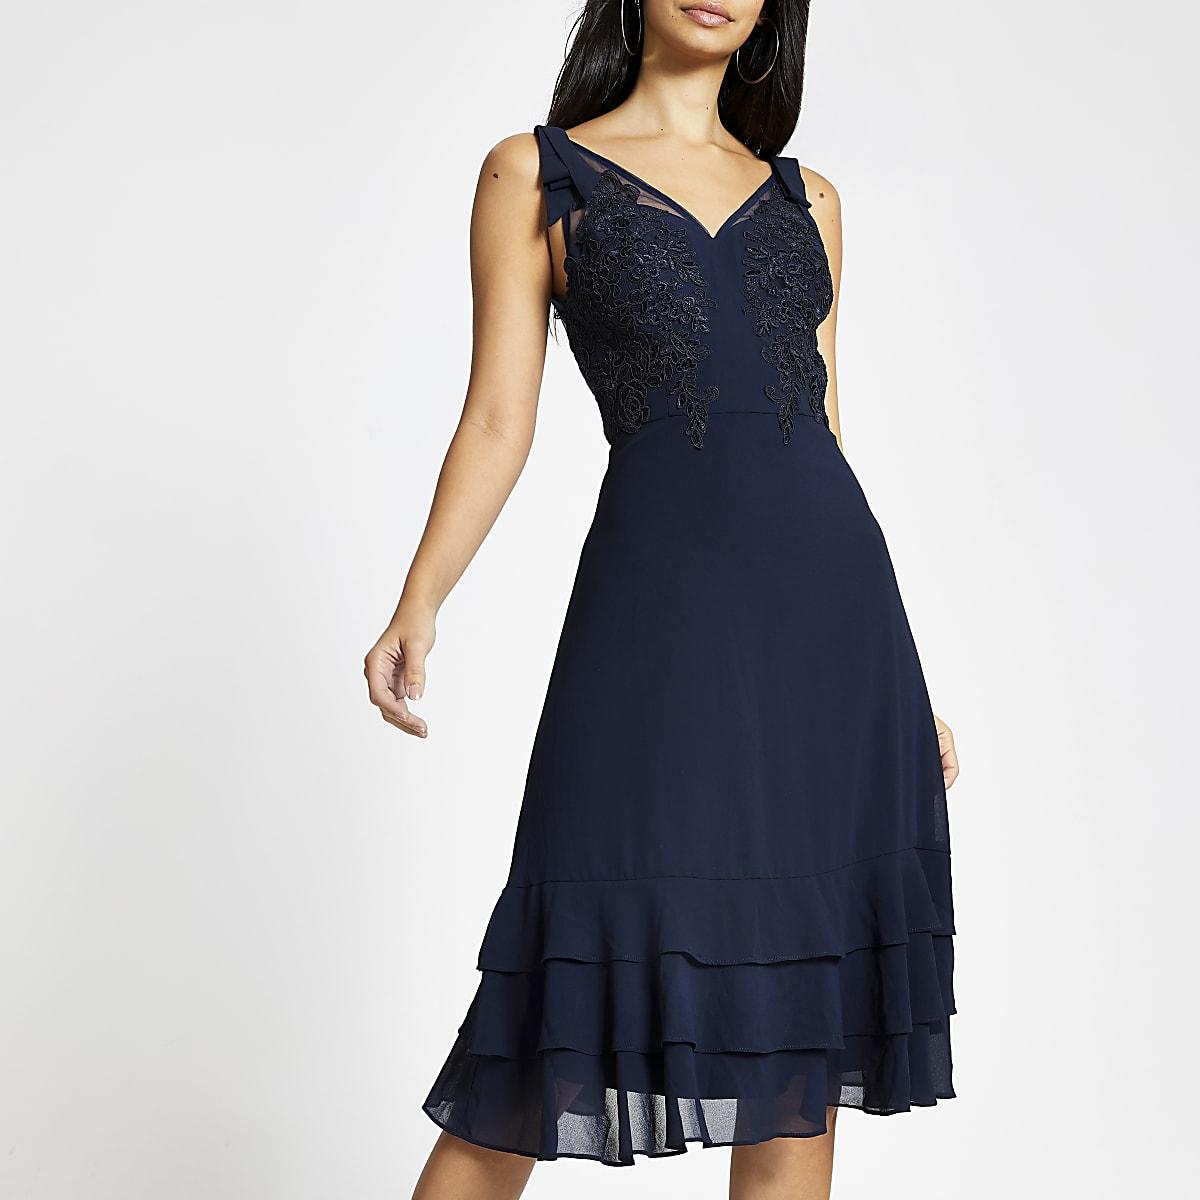 Chi Chi London navy lace dress